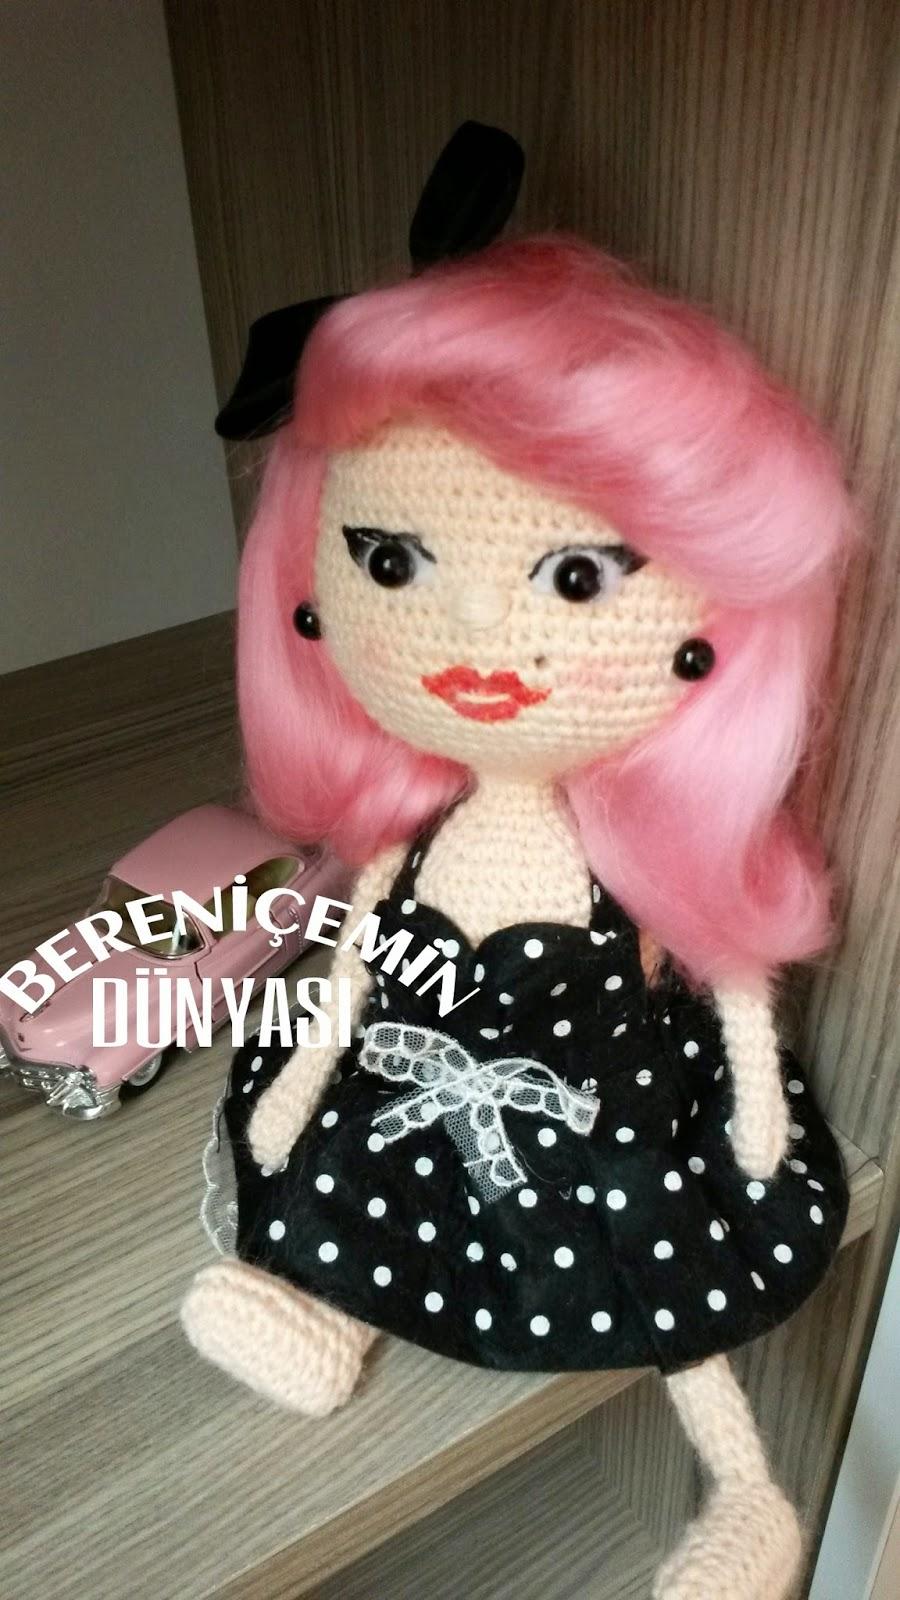 AMİGURUMİ DUDAK İŞLEME (amigurumi lips embroidery) 👄 - YouTube | 1600x900